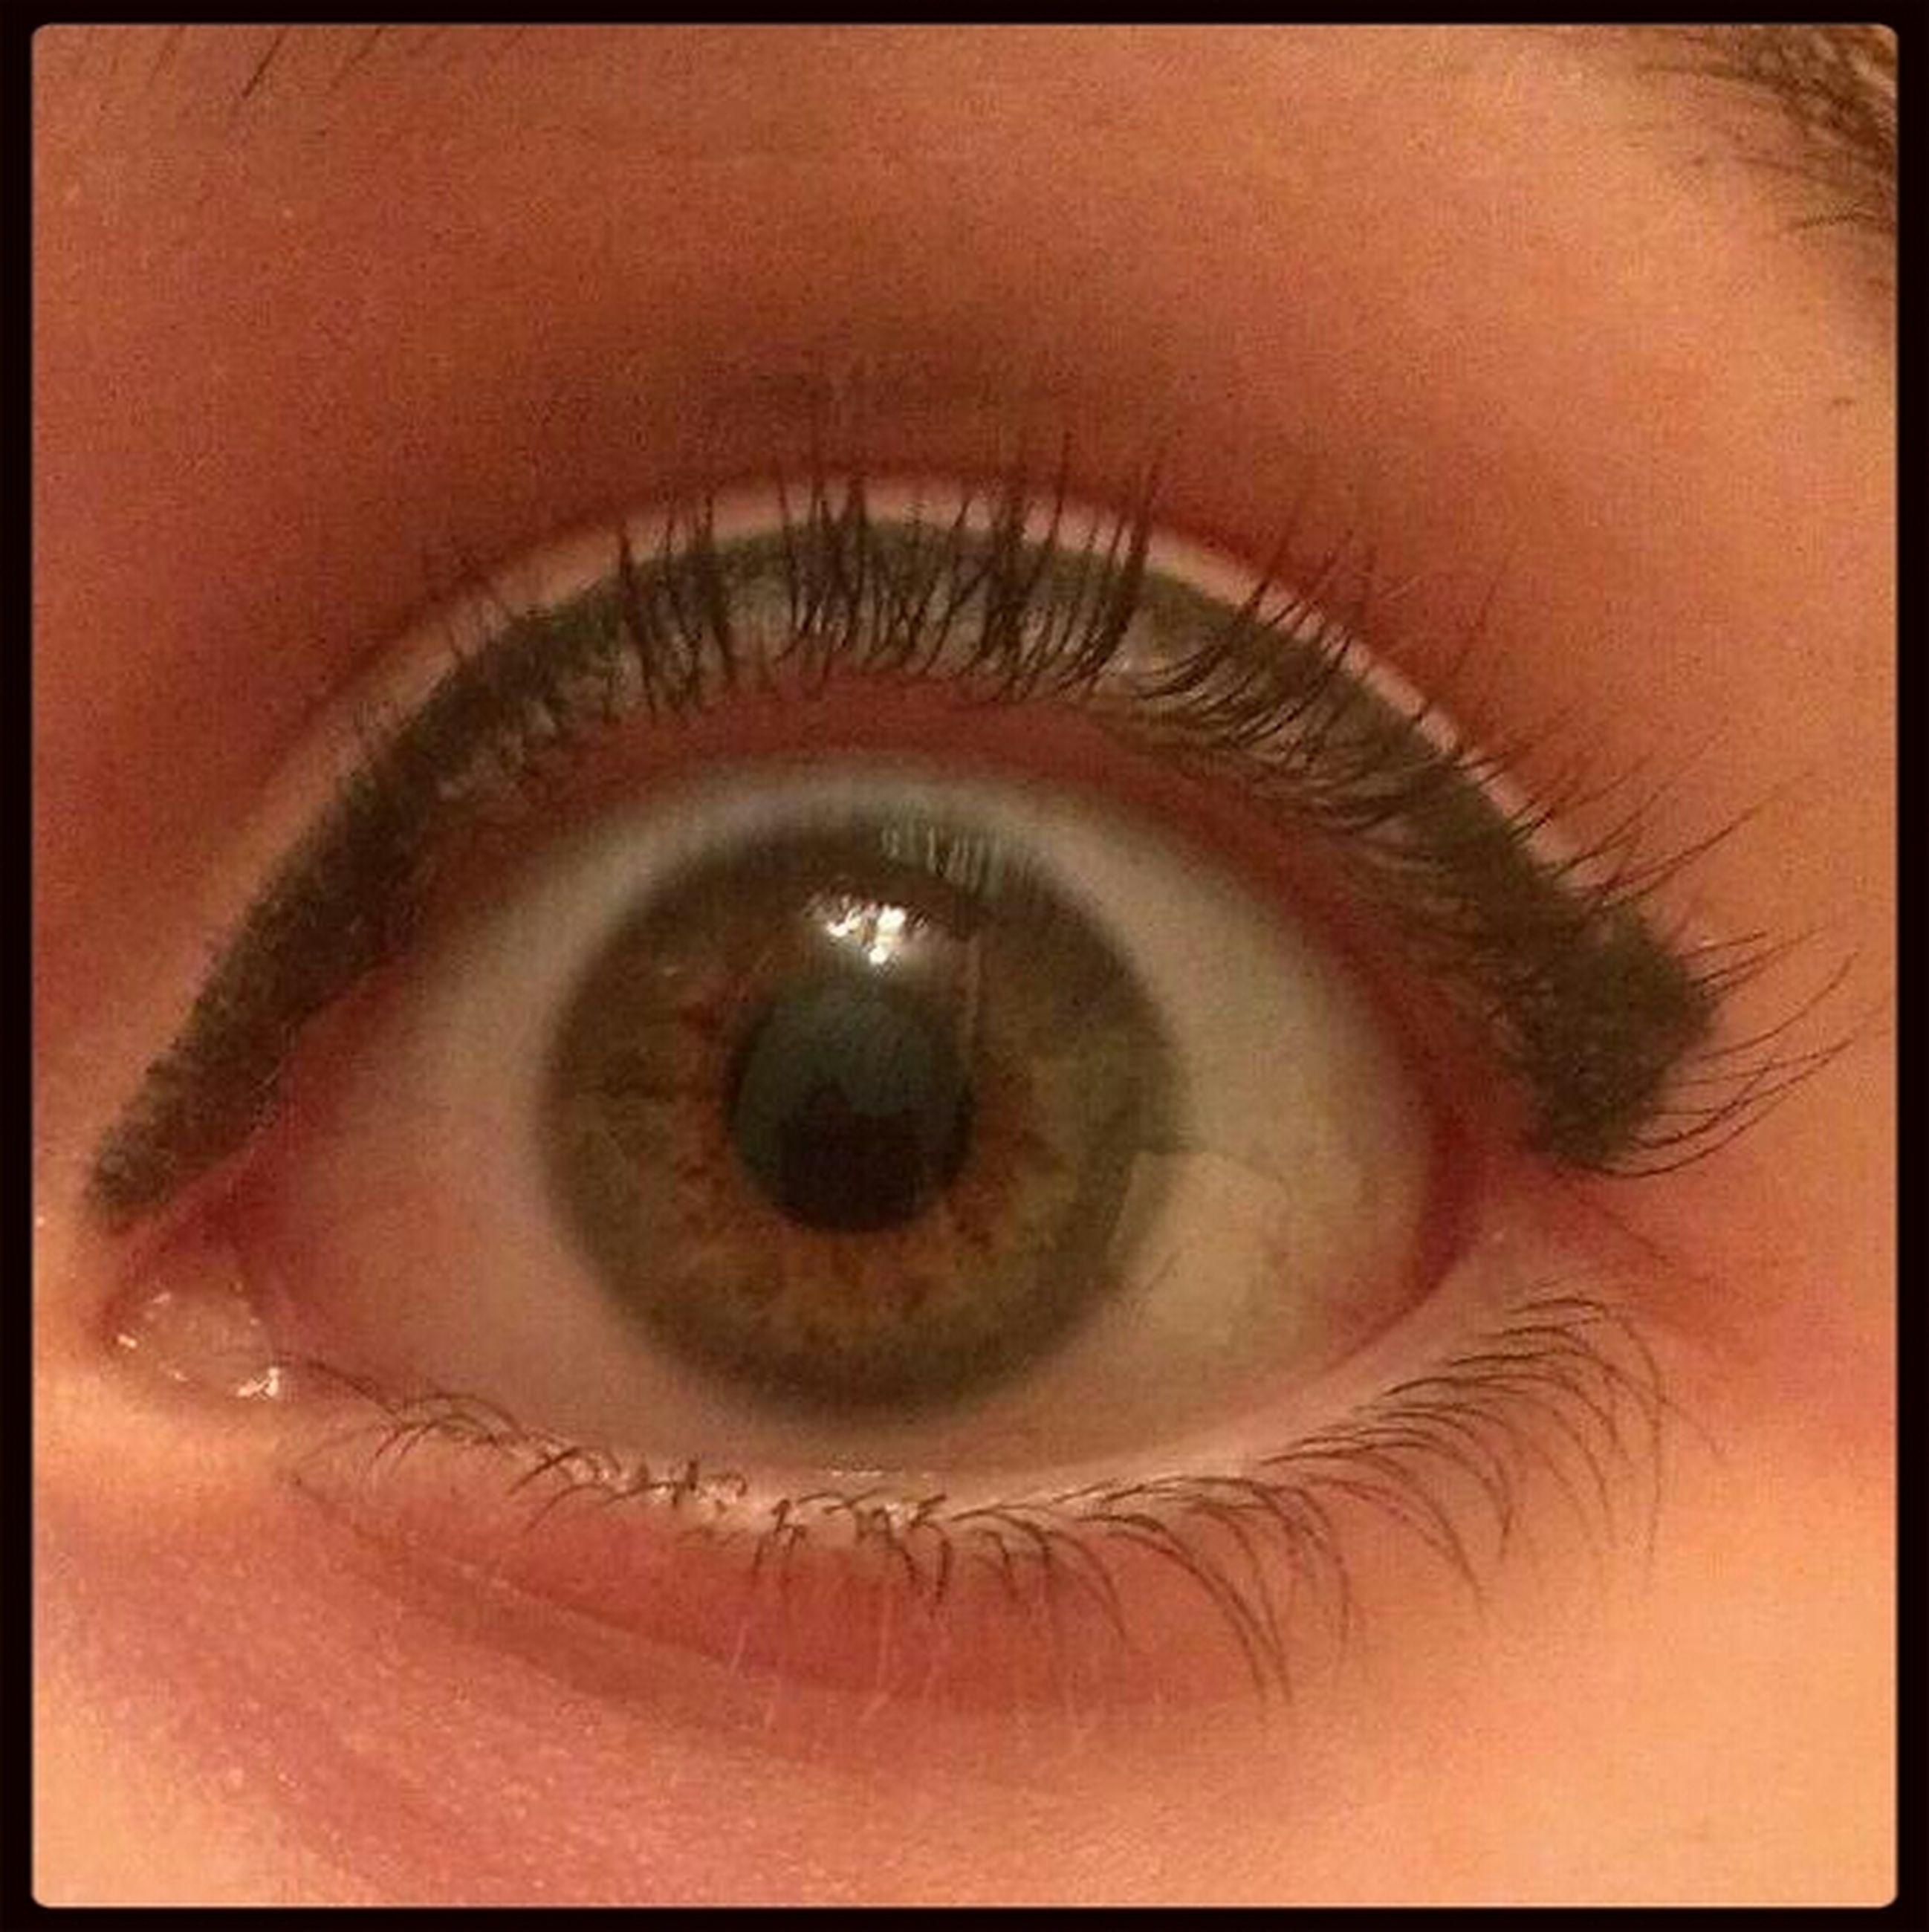 human eye, eyelash, eyesight, close-up, auto post production filter, sensory perception, transfer print, indoors, extreme close-up, part of, looking at camera, iris - eye, eyeball, reflection, portrait, human skin, full frame